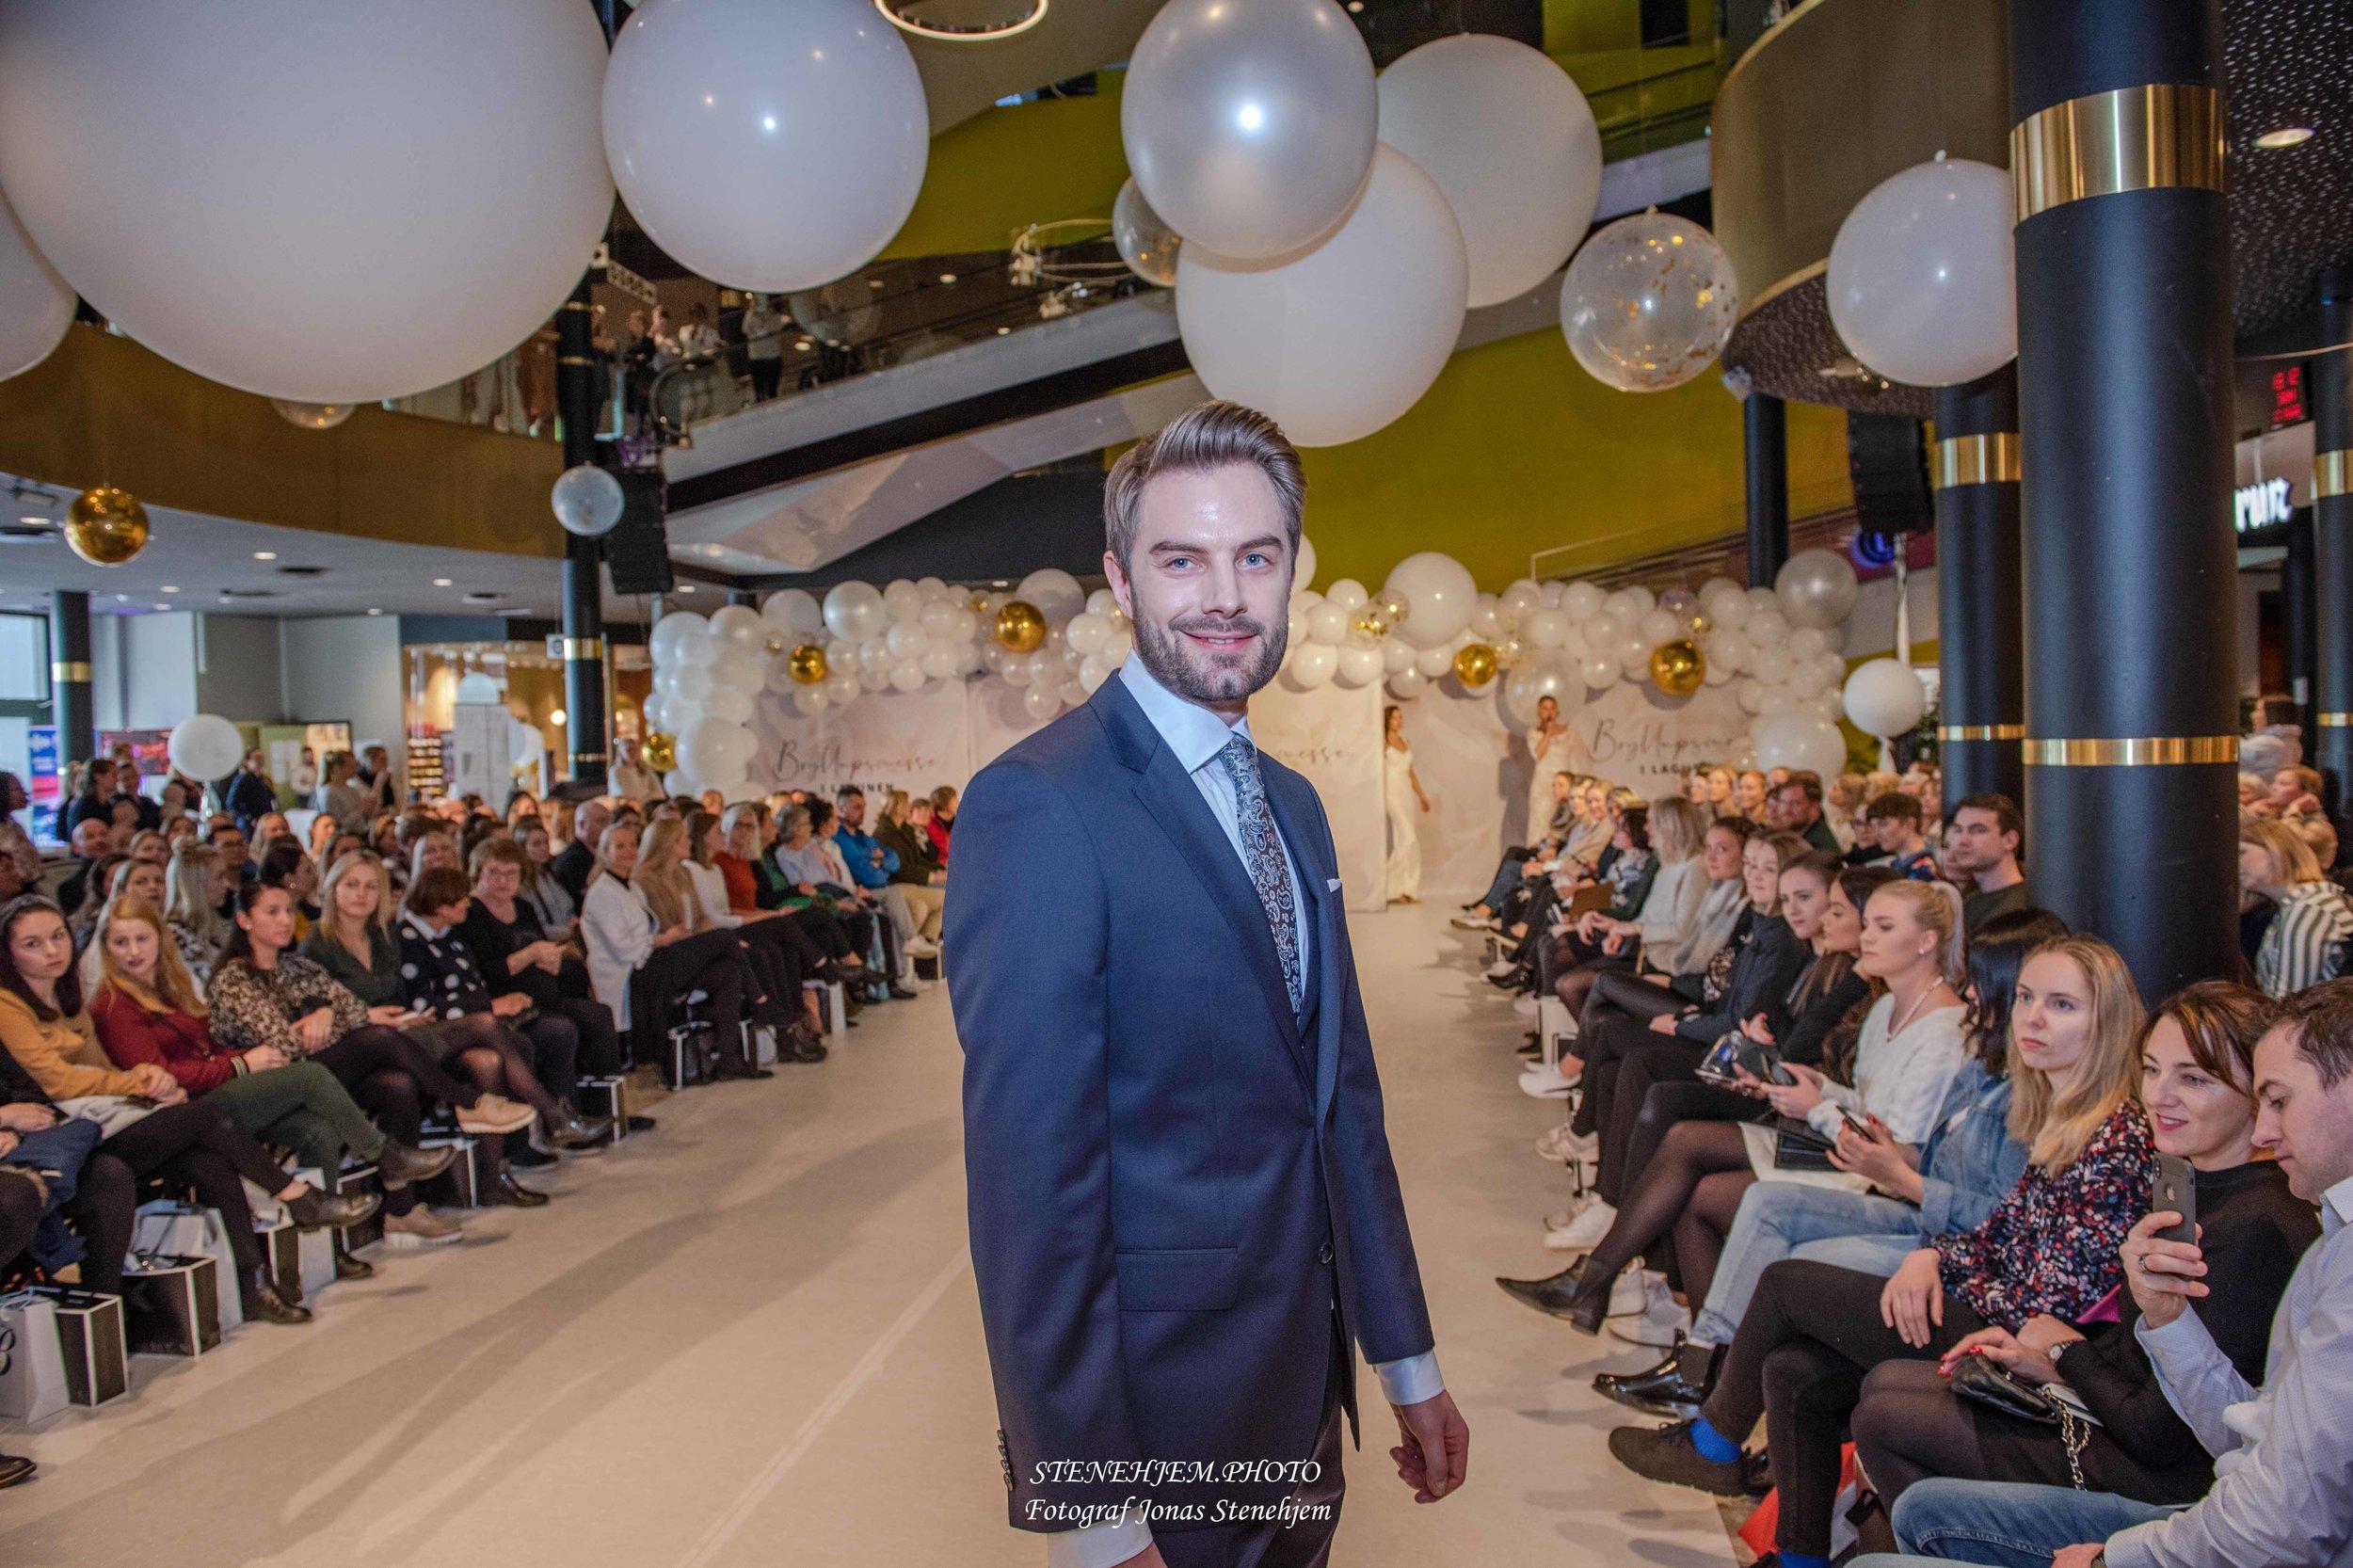 Bryllupsmesse_Lagunen_mittaltweddingfair__022.jpg